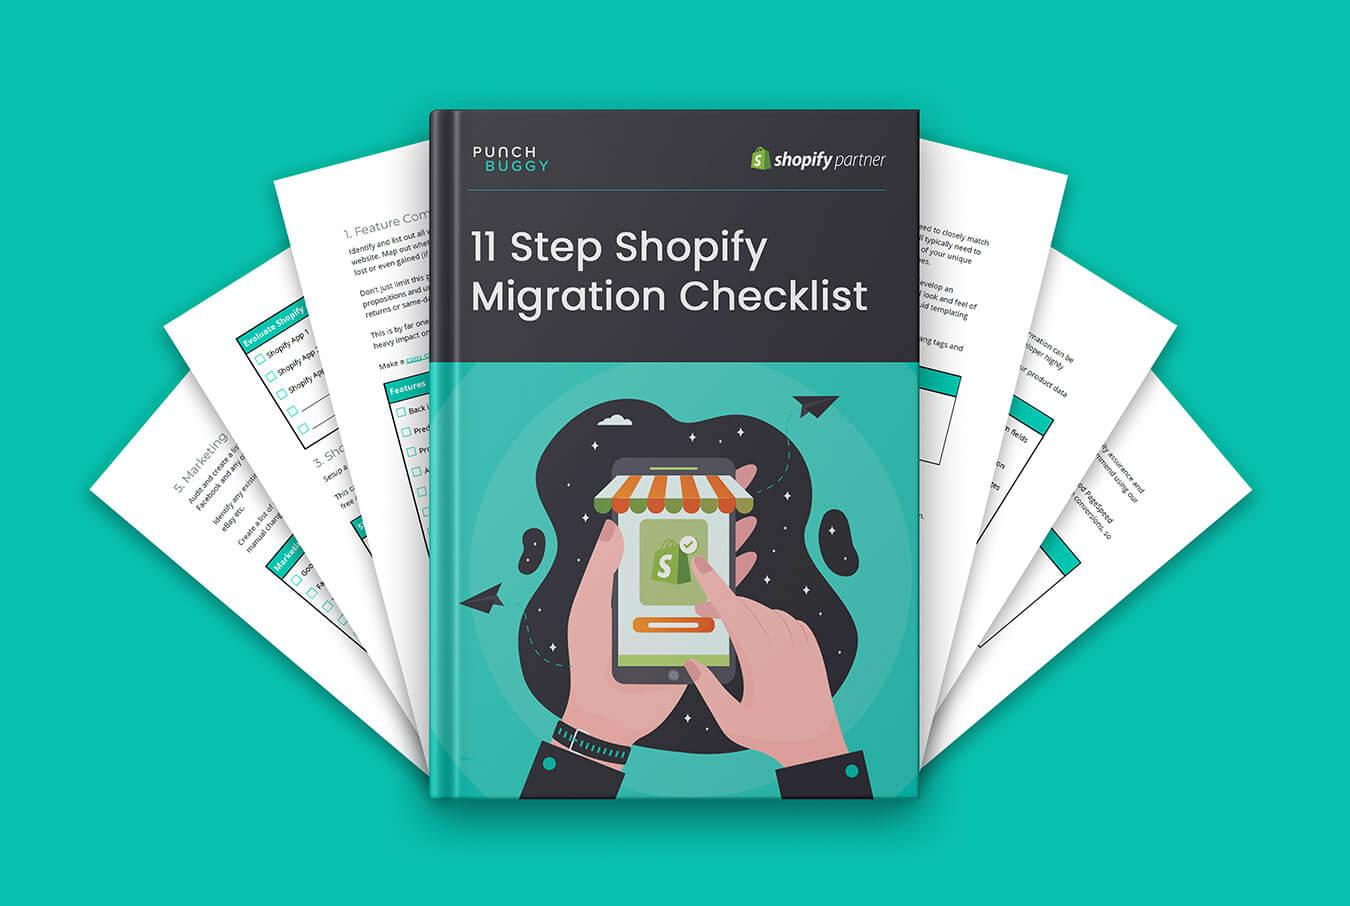 FREE 11 Step Shopify Migration Checklist